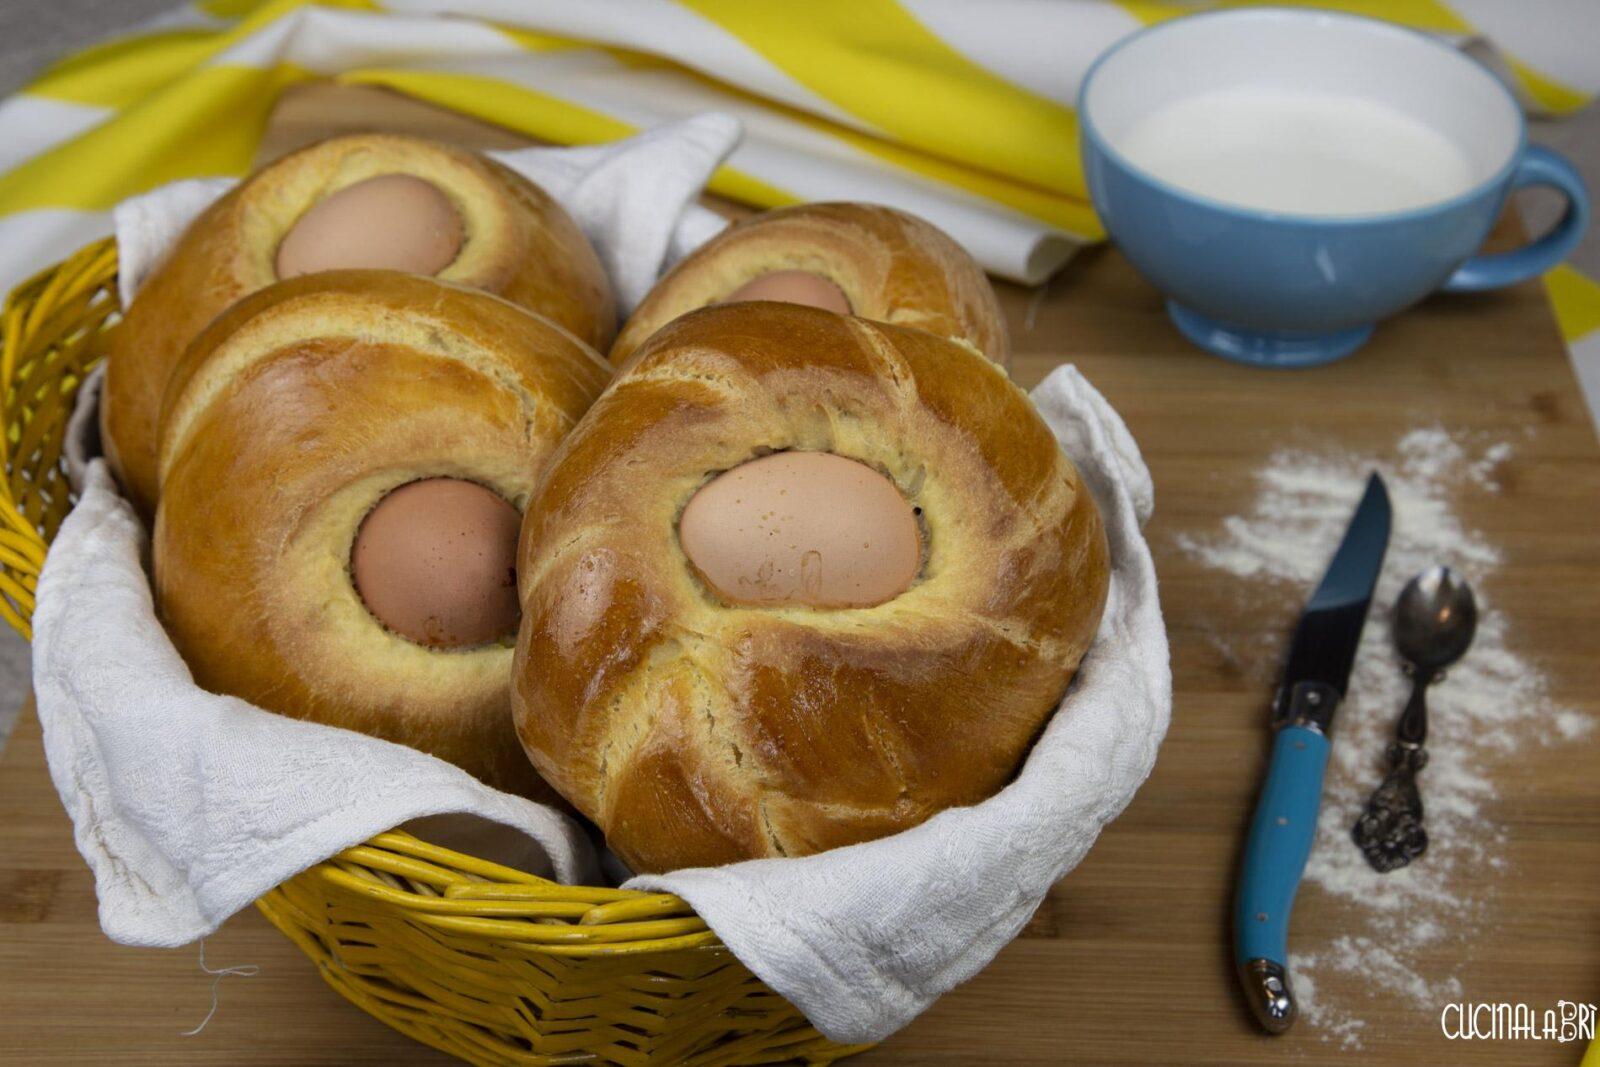 Ngute - Sgute - Cuzzupe - Dolce Pasqua Calabria